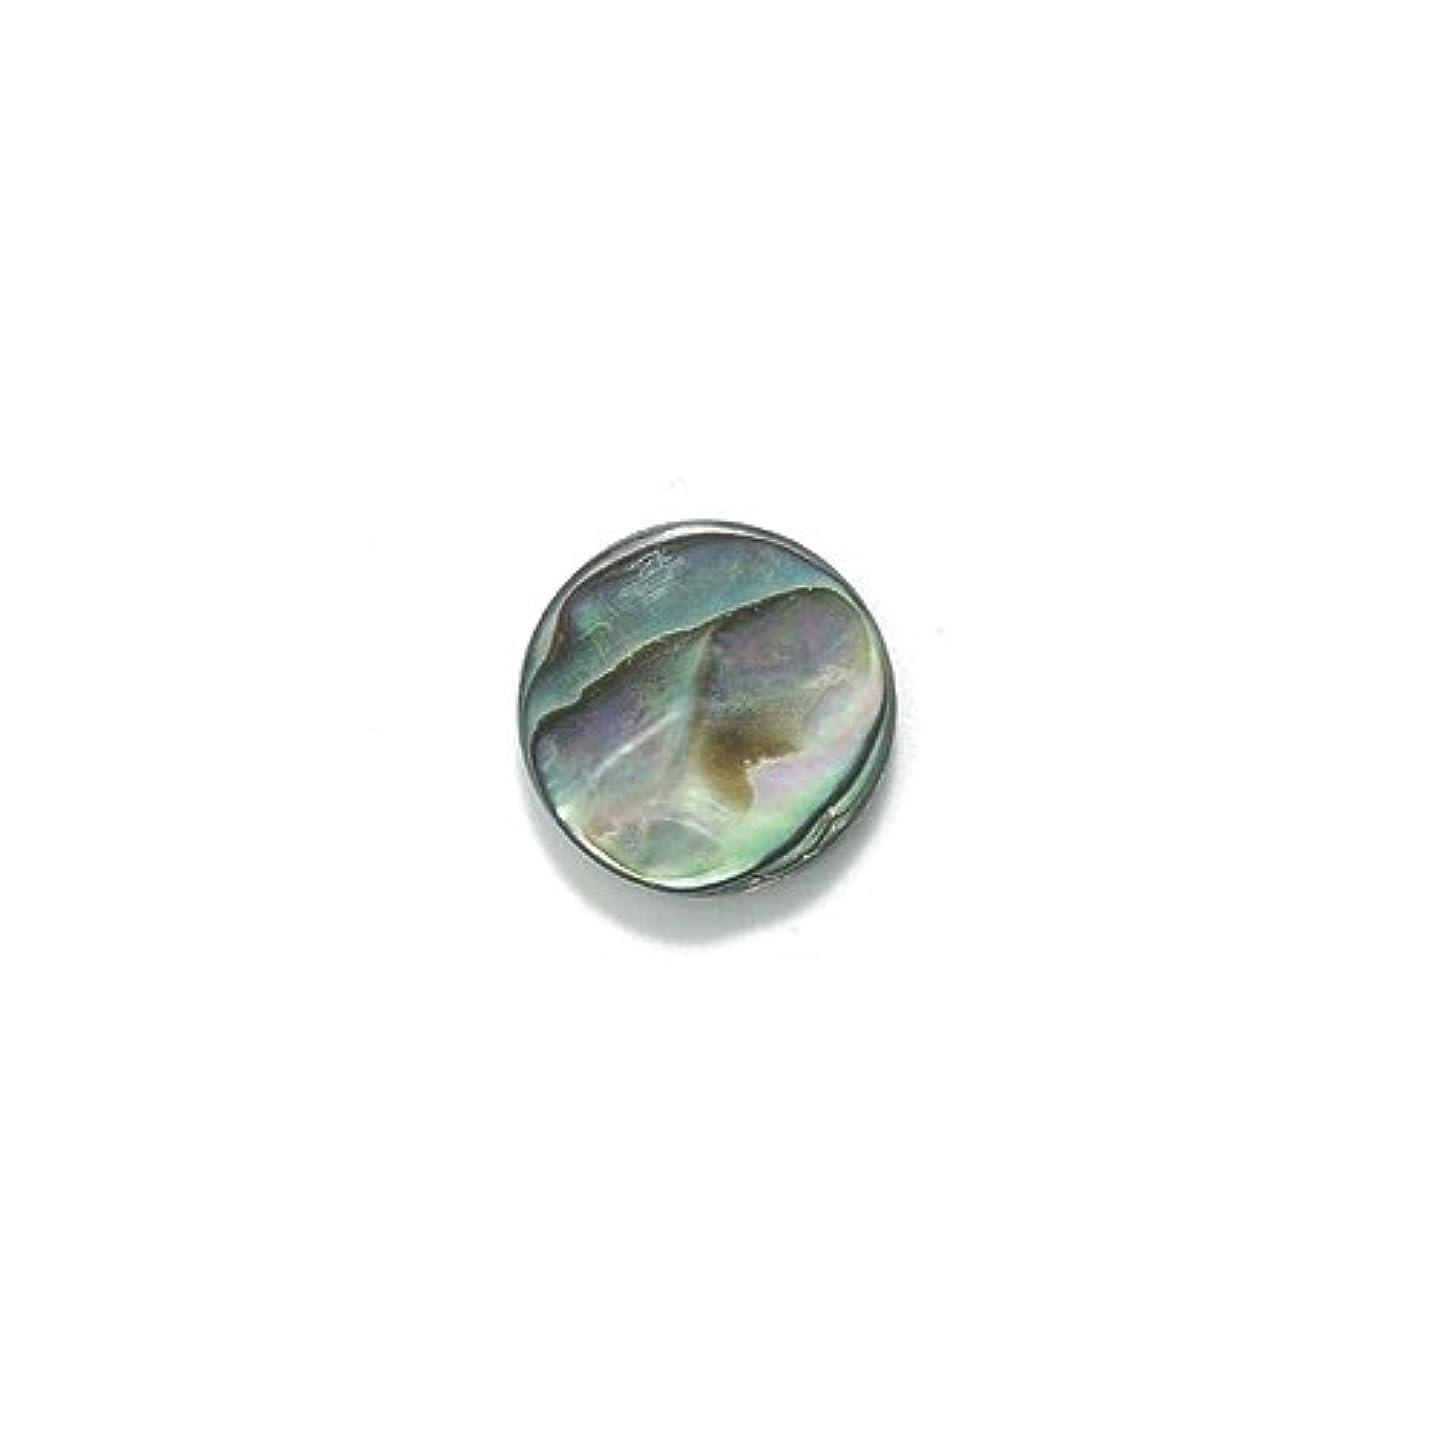 Shipwreck Abalone Flat Round Beads, 12-mm, 32-Piece/Pack